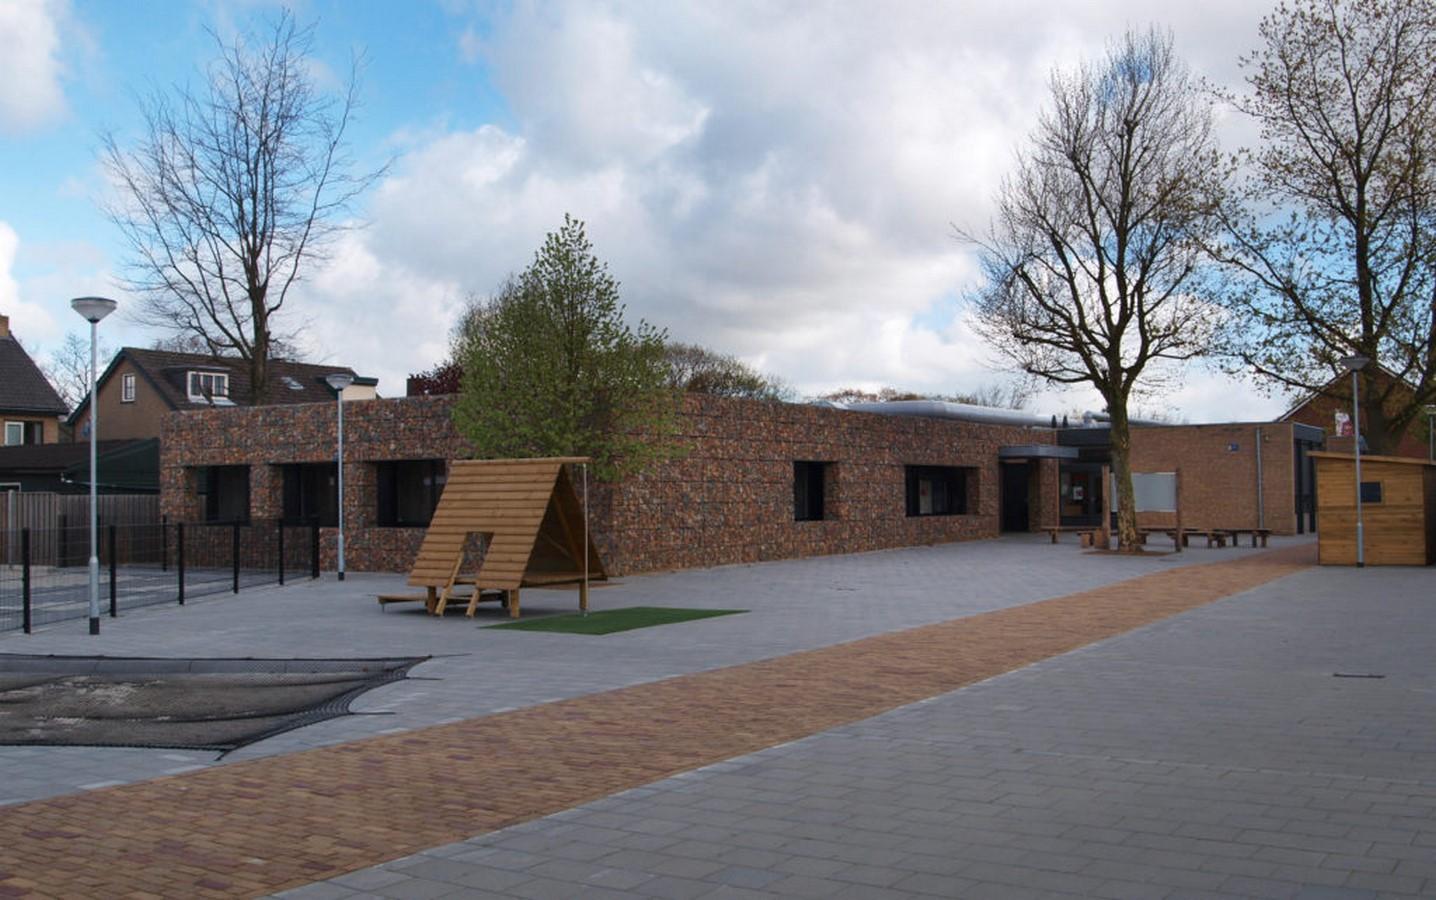 Architects in Breda - Top 55 Architects in Breda - Sheet55